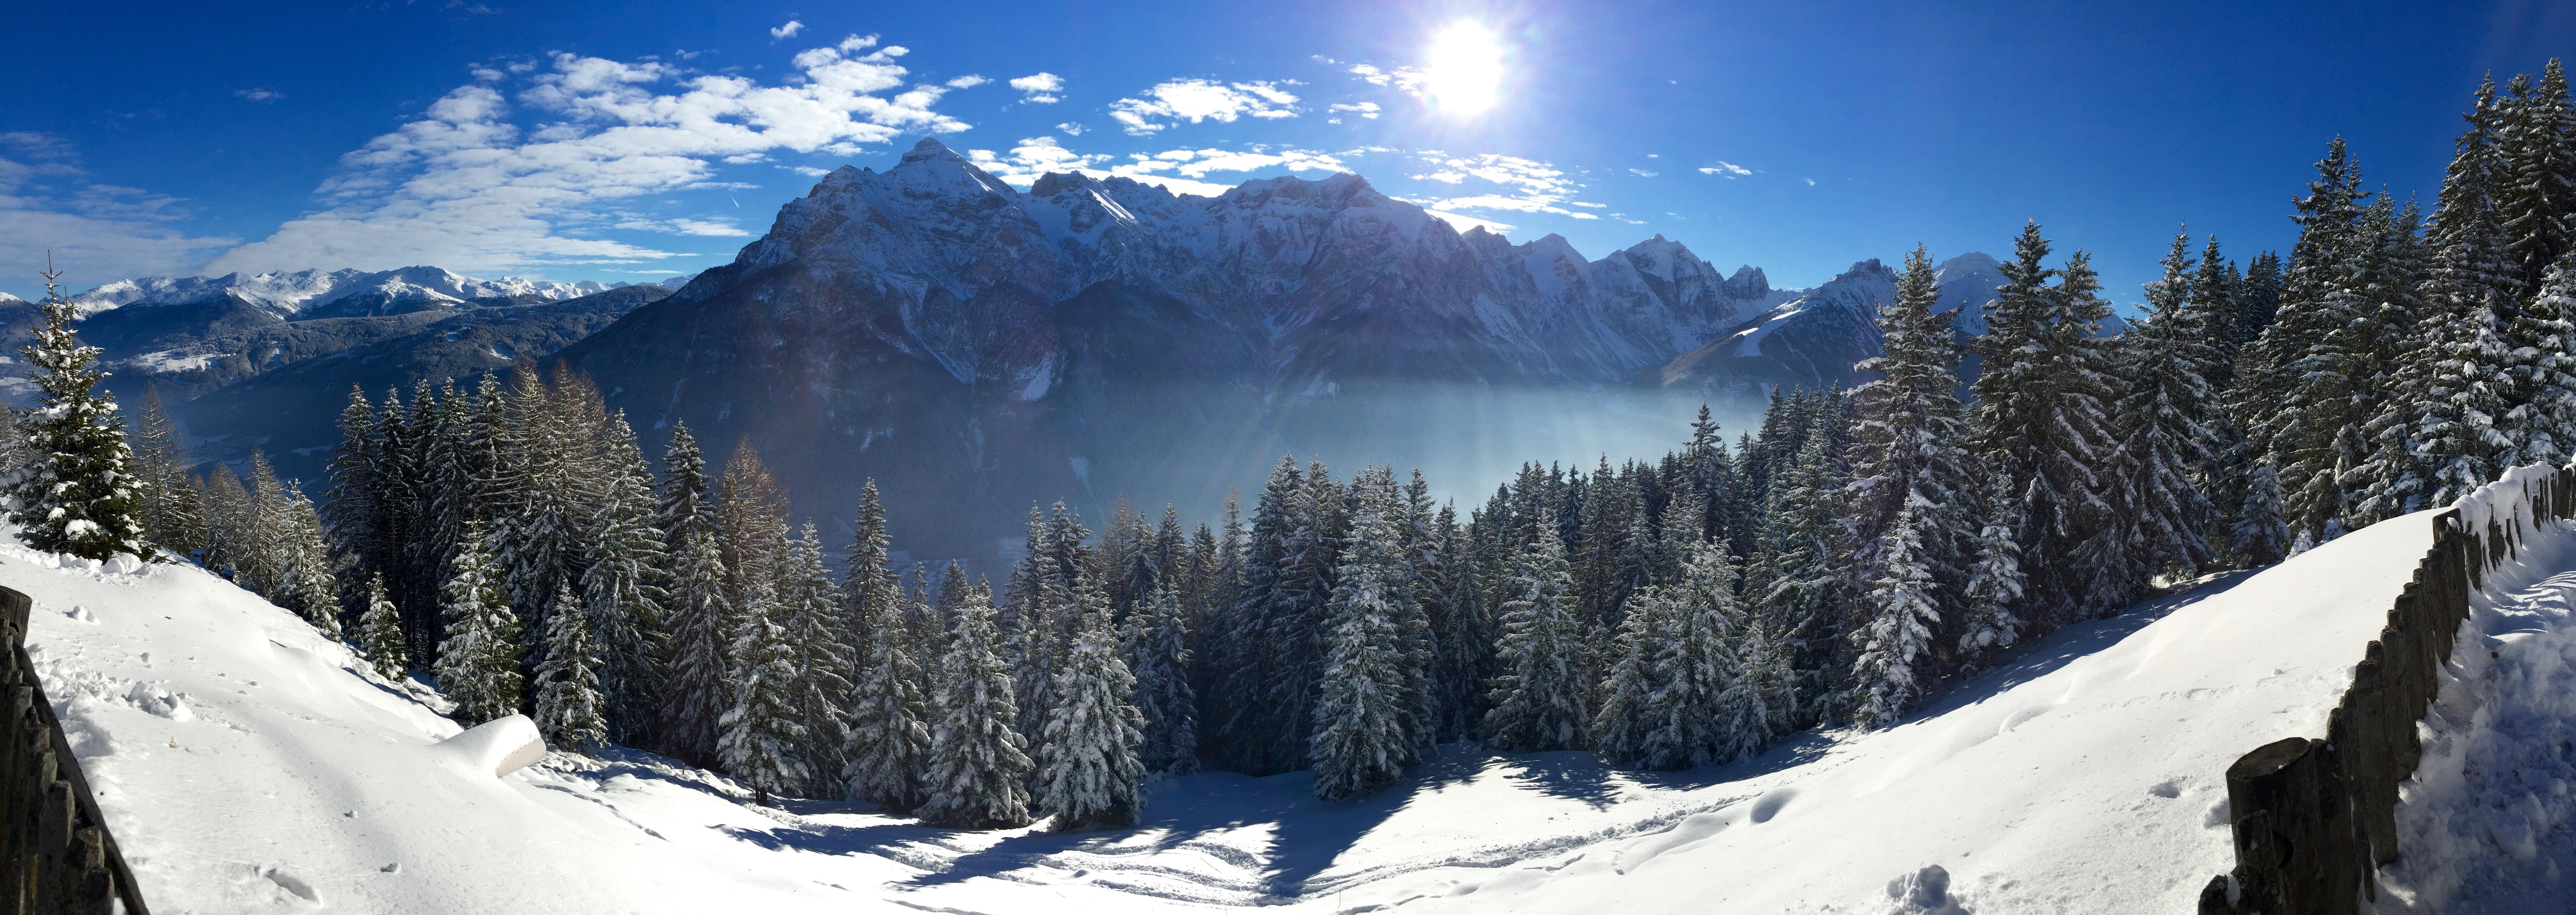 Galtalm | Doug's Mountain Getaway